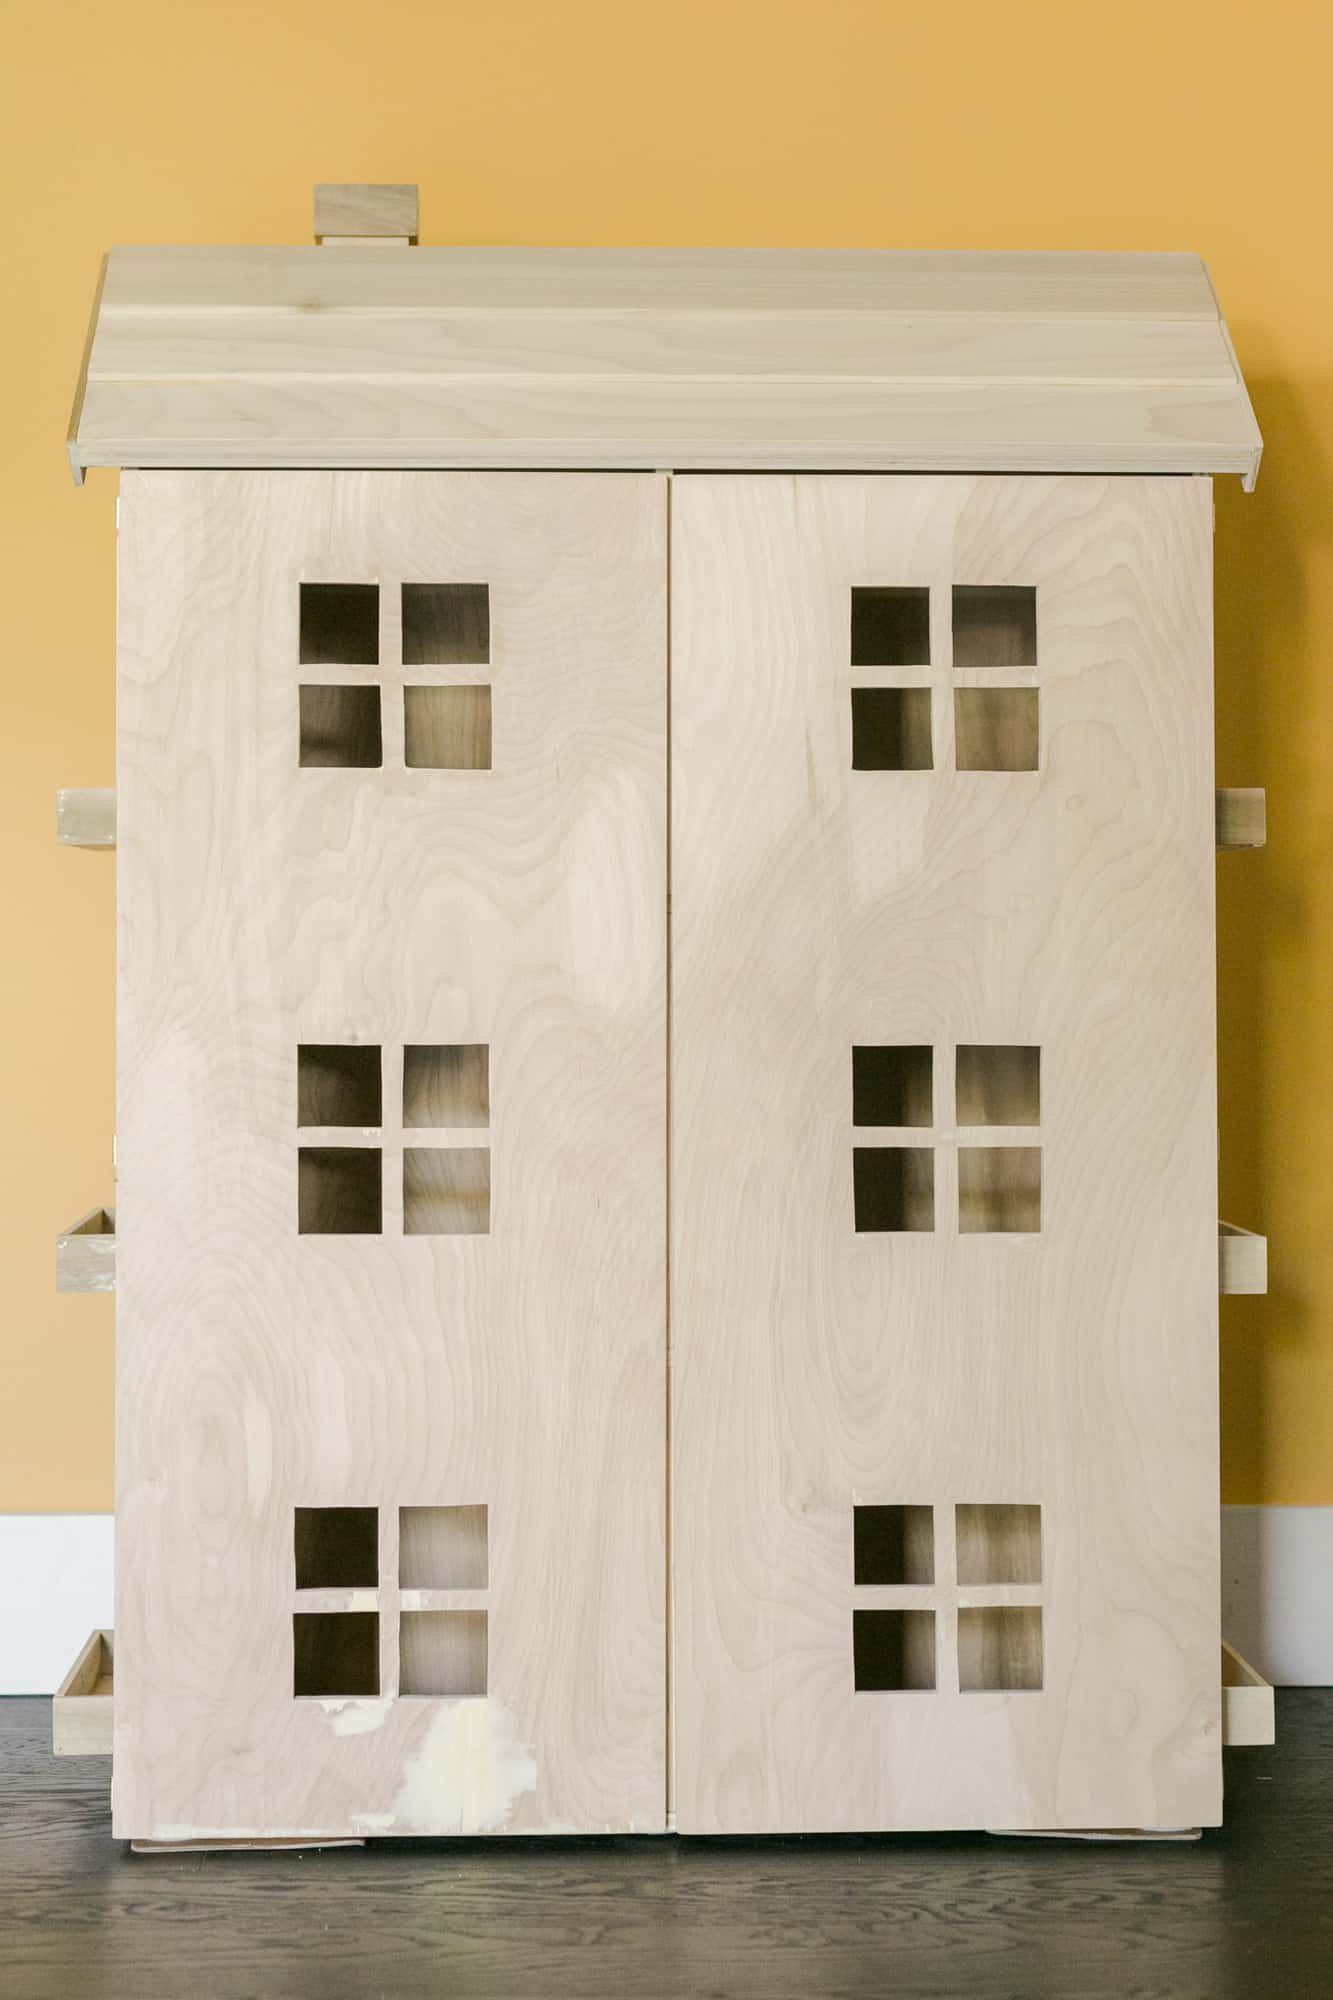 An unpainted wooden dollhouse.